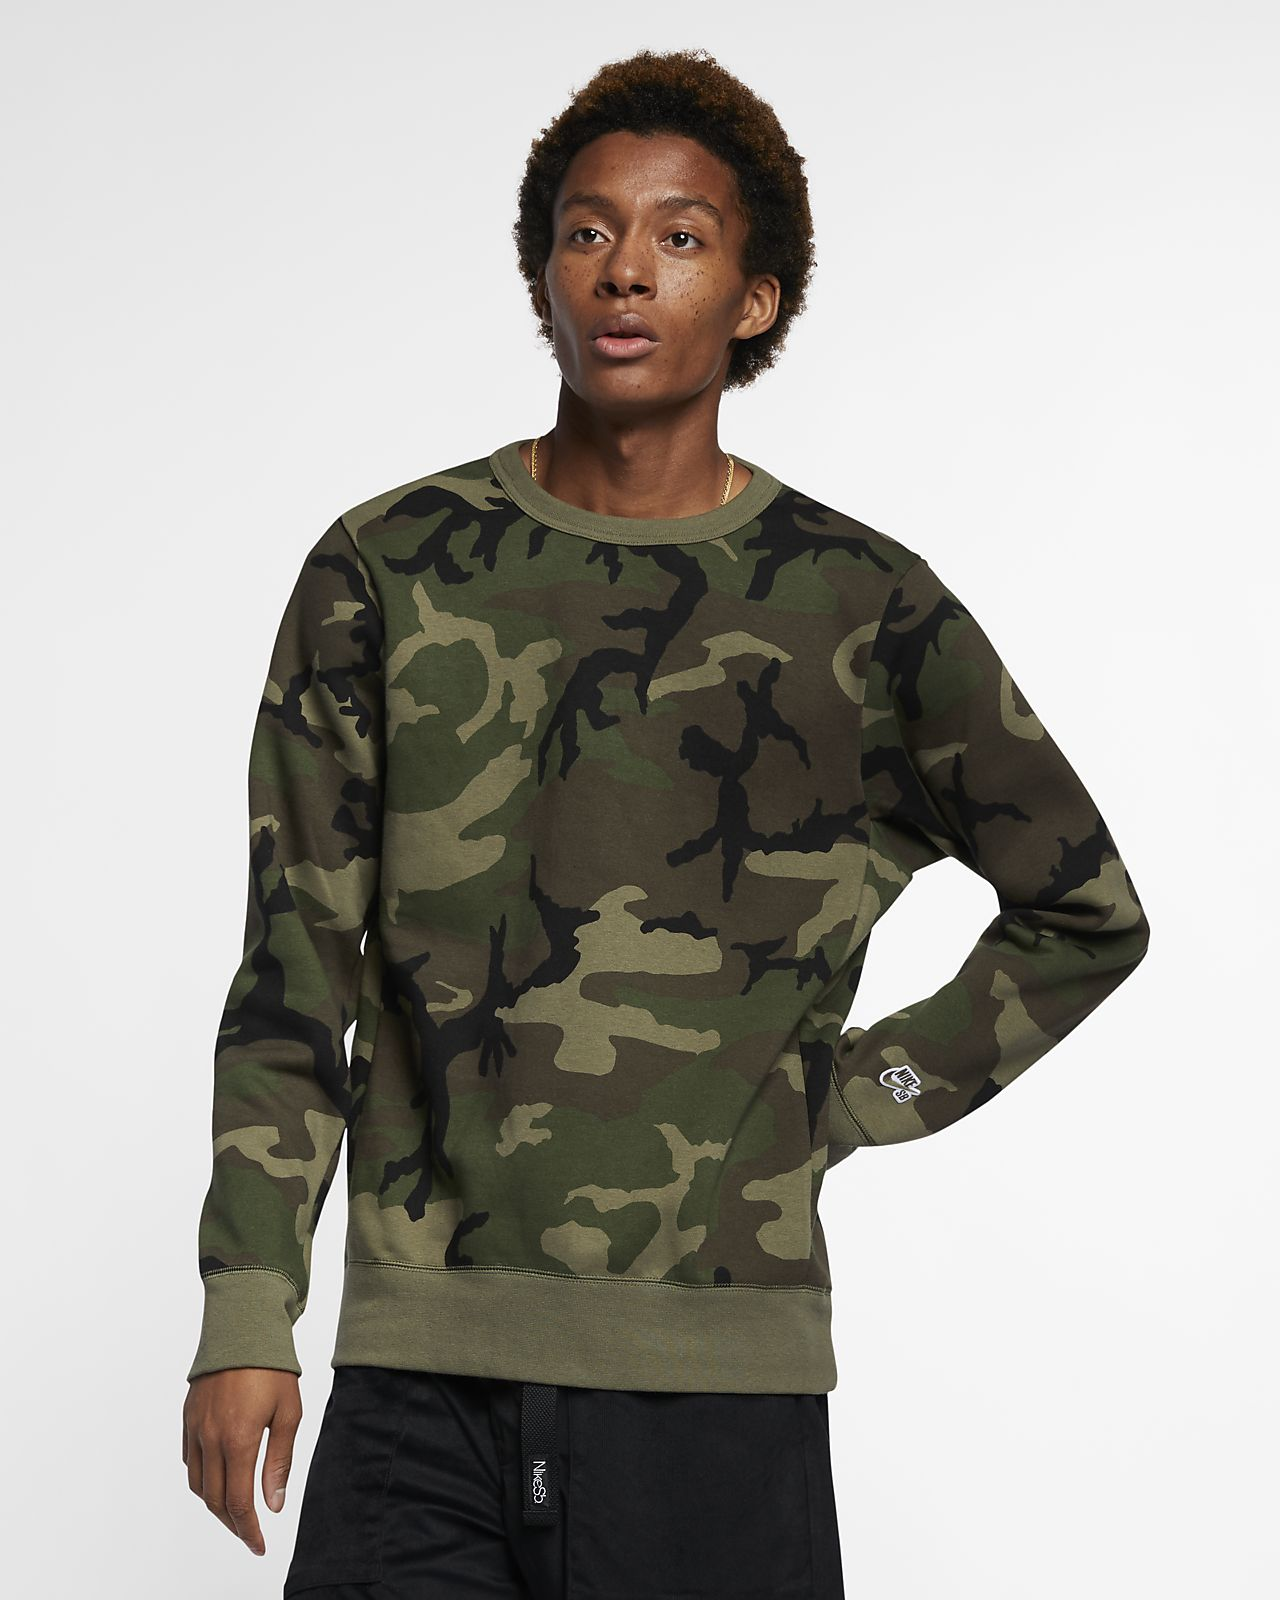 De Homme Sb Haut Ca Pour Camouflage Icon Nike Skateboard TppWv0dB